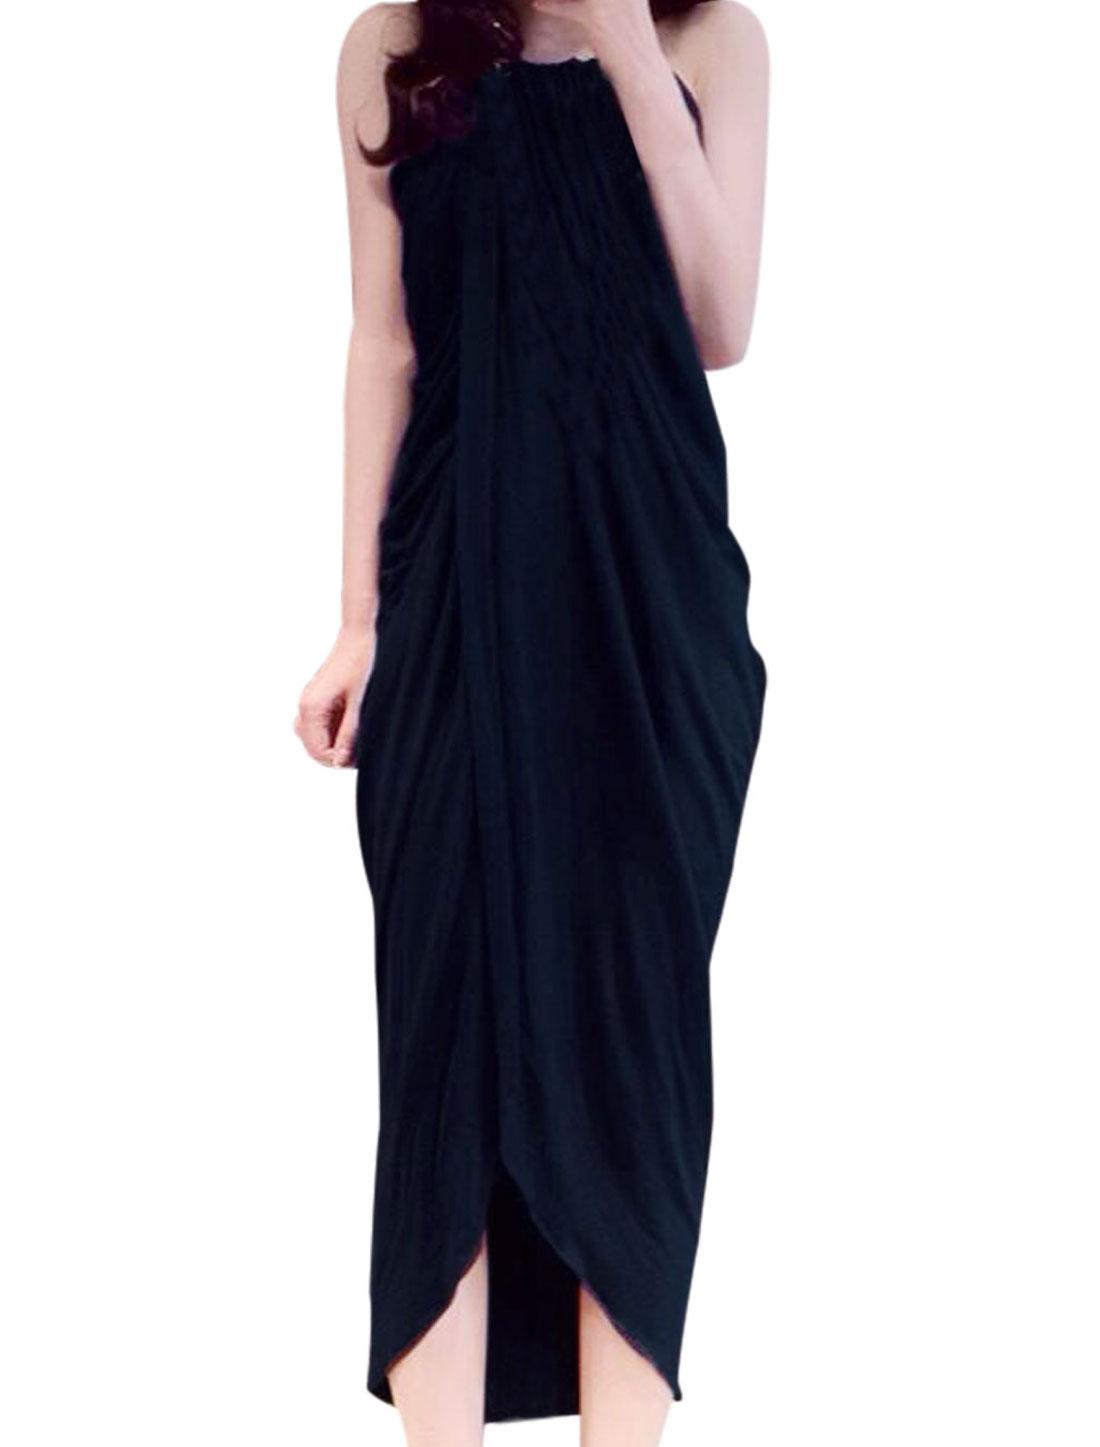 Lady Round Neck Spaghetti Strap Irregular Hem Wrap Dress Navy Blue XS